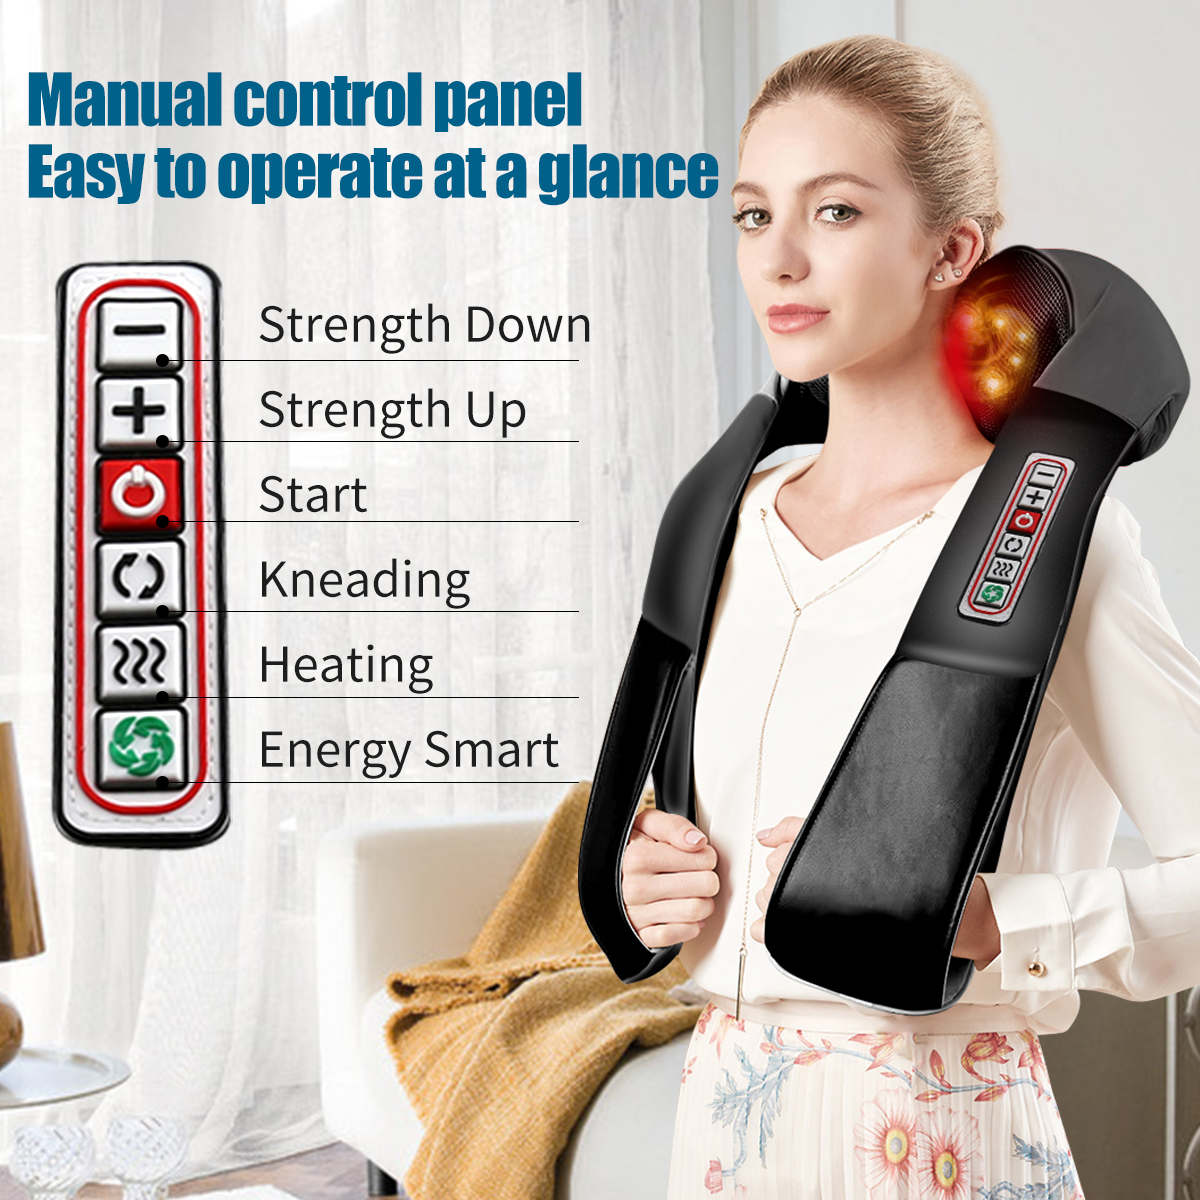 3D kneading Shiatsu Infrared Heated Kneading Car/Home Massagem Cervical Back Neck Massager Shawl Device Shoulder Massager Fitness 1ef722433d607dd9d2b8b7: China|Poland|Russian Federation|United States